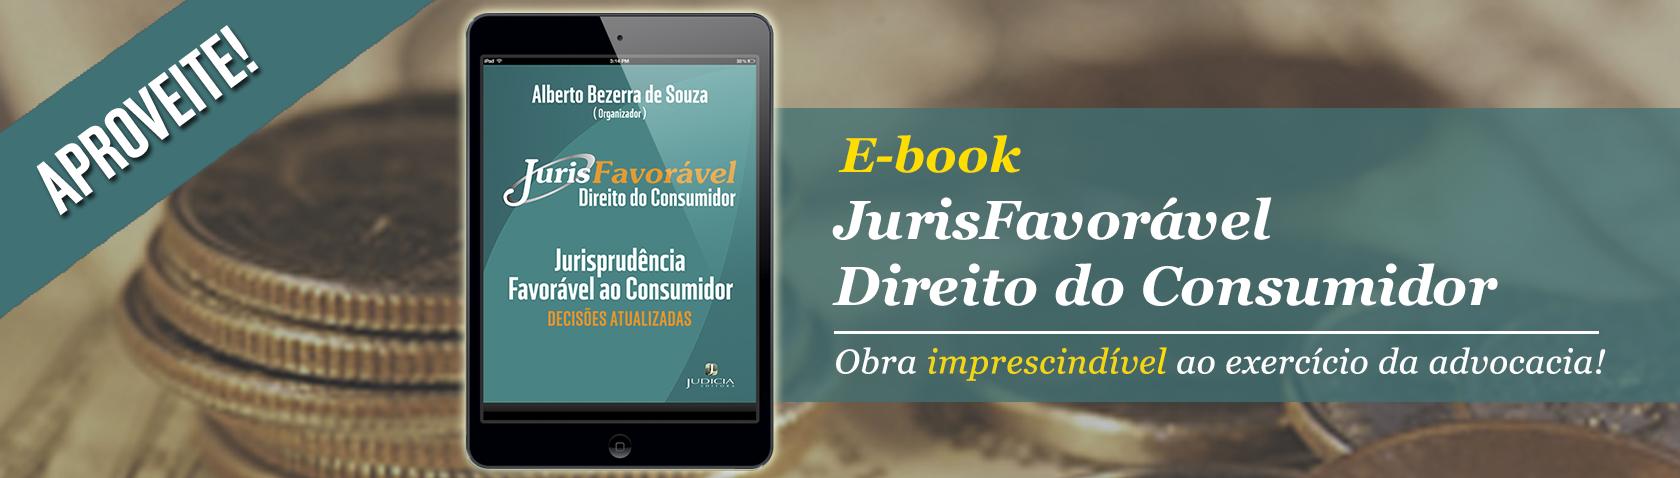 banner_jurisfavoravel_consumidor_01